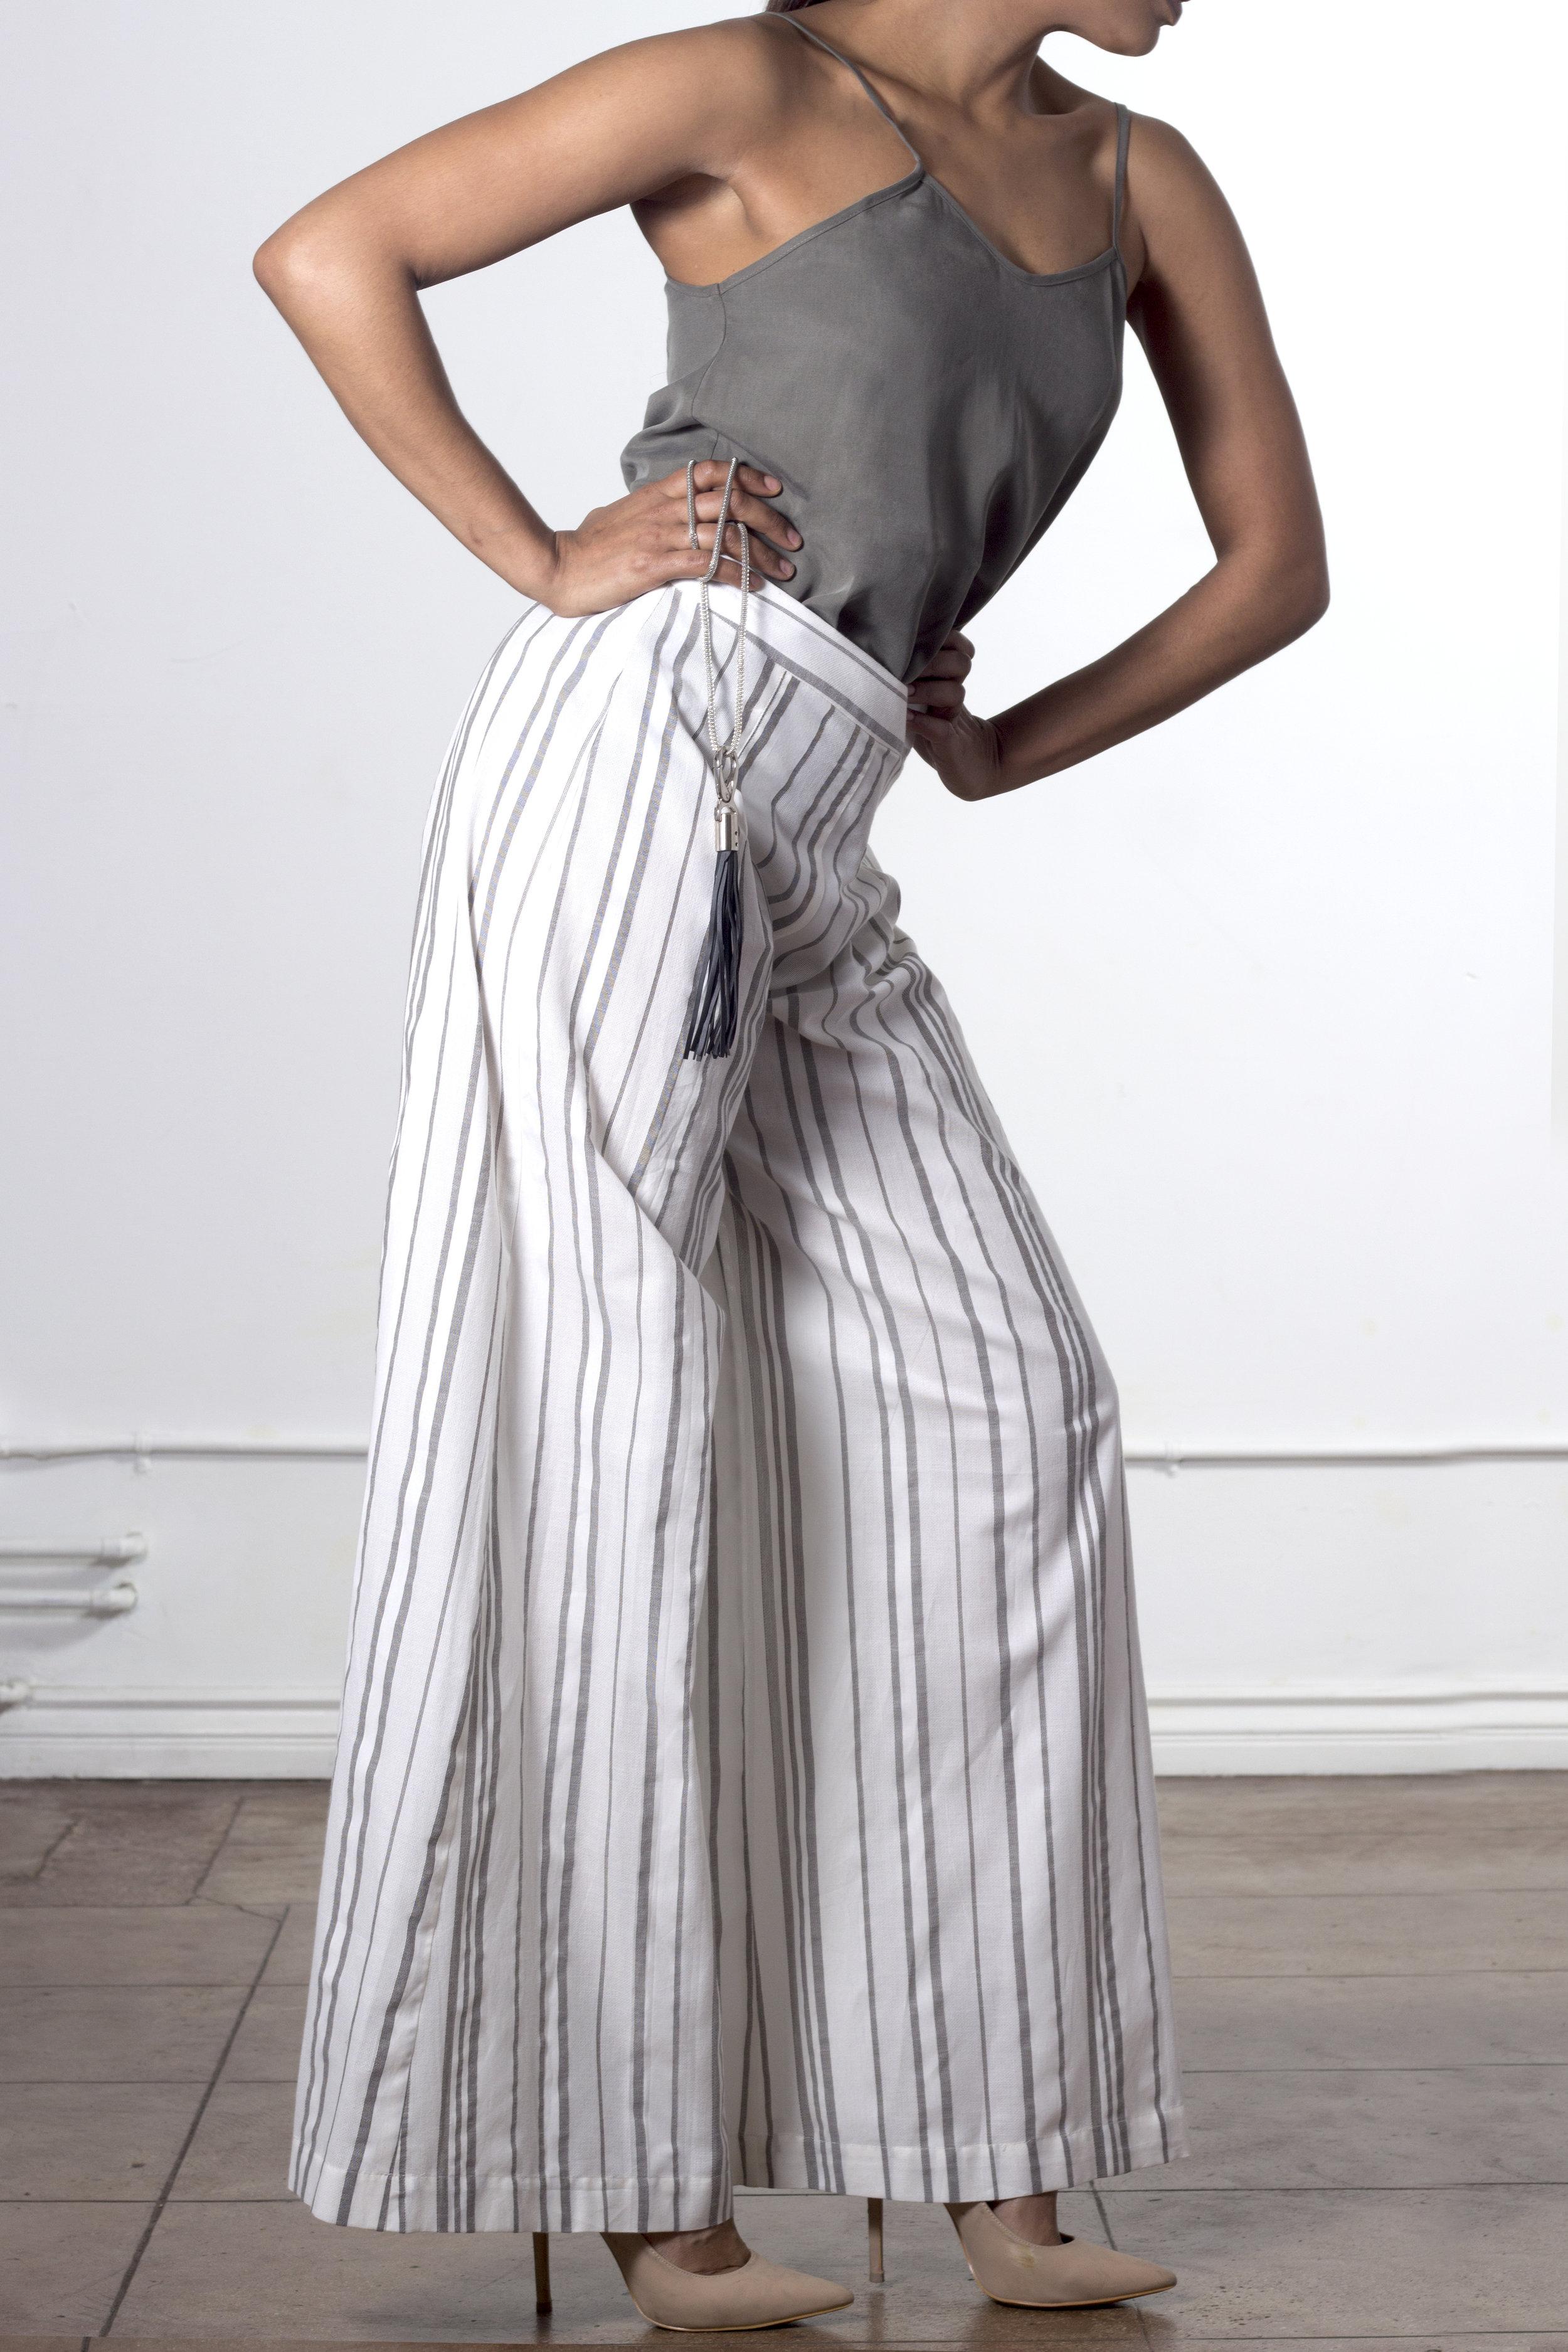 4-Jessica-Faulkner-Womens-Contemporary-Clothing-Liliana-Wide-Leg-Trousers-Jessica-Faulkner-2.jpg